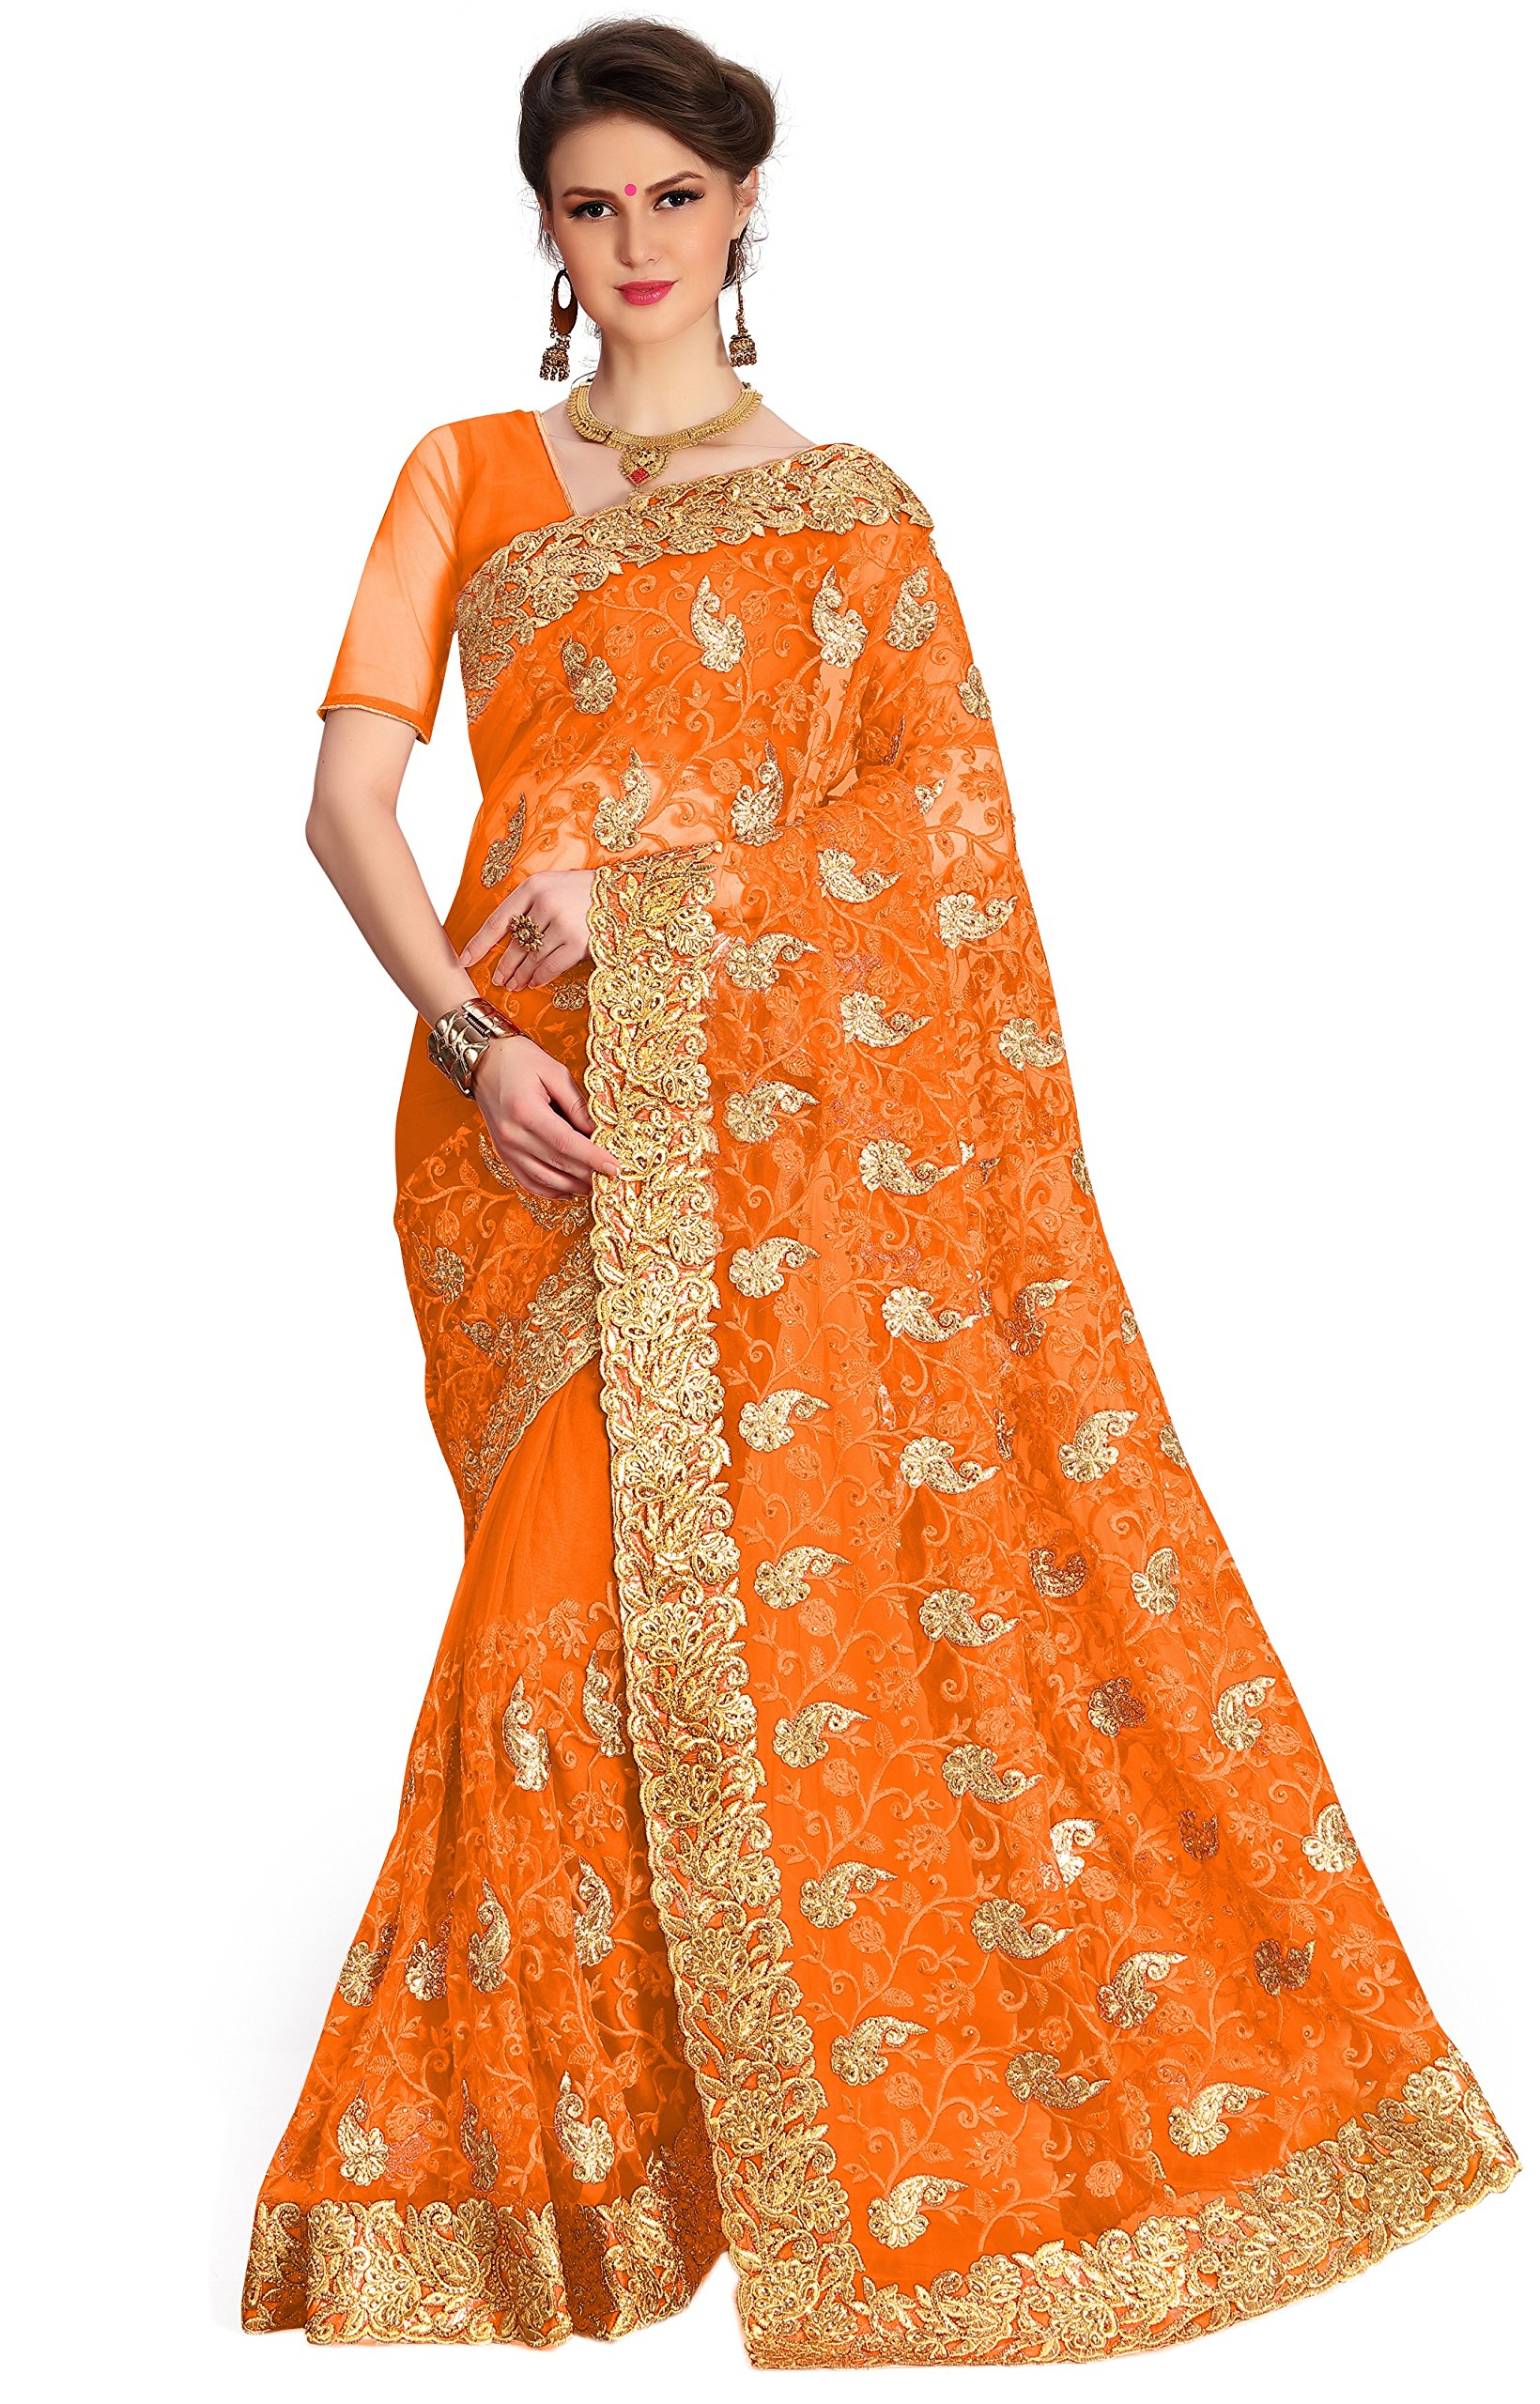 Panash Trends Women S Net Heavy Embroidery Work Saree Ujj K675 R T O